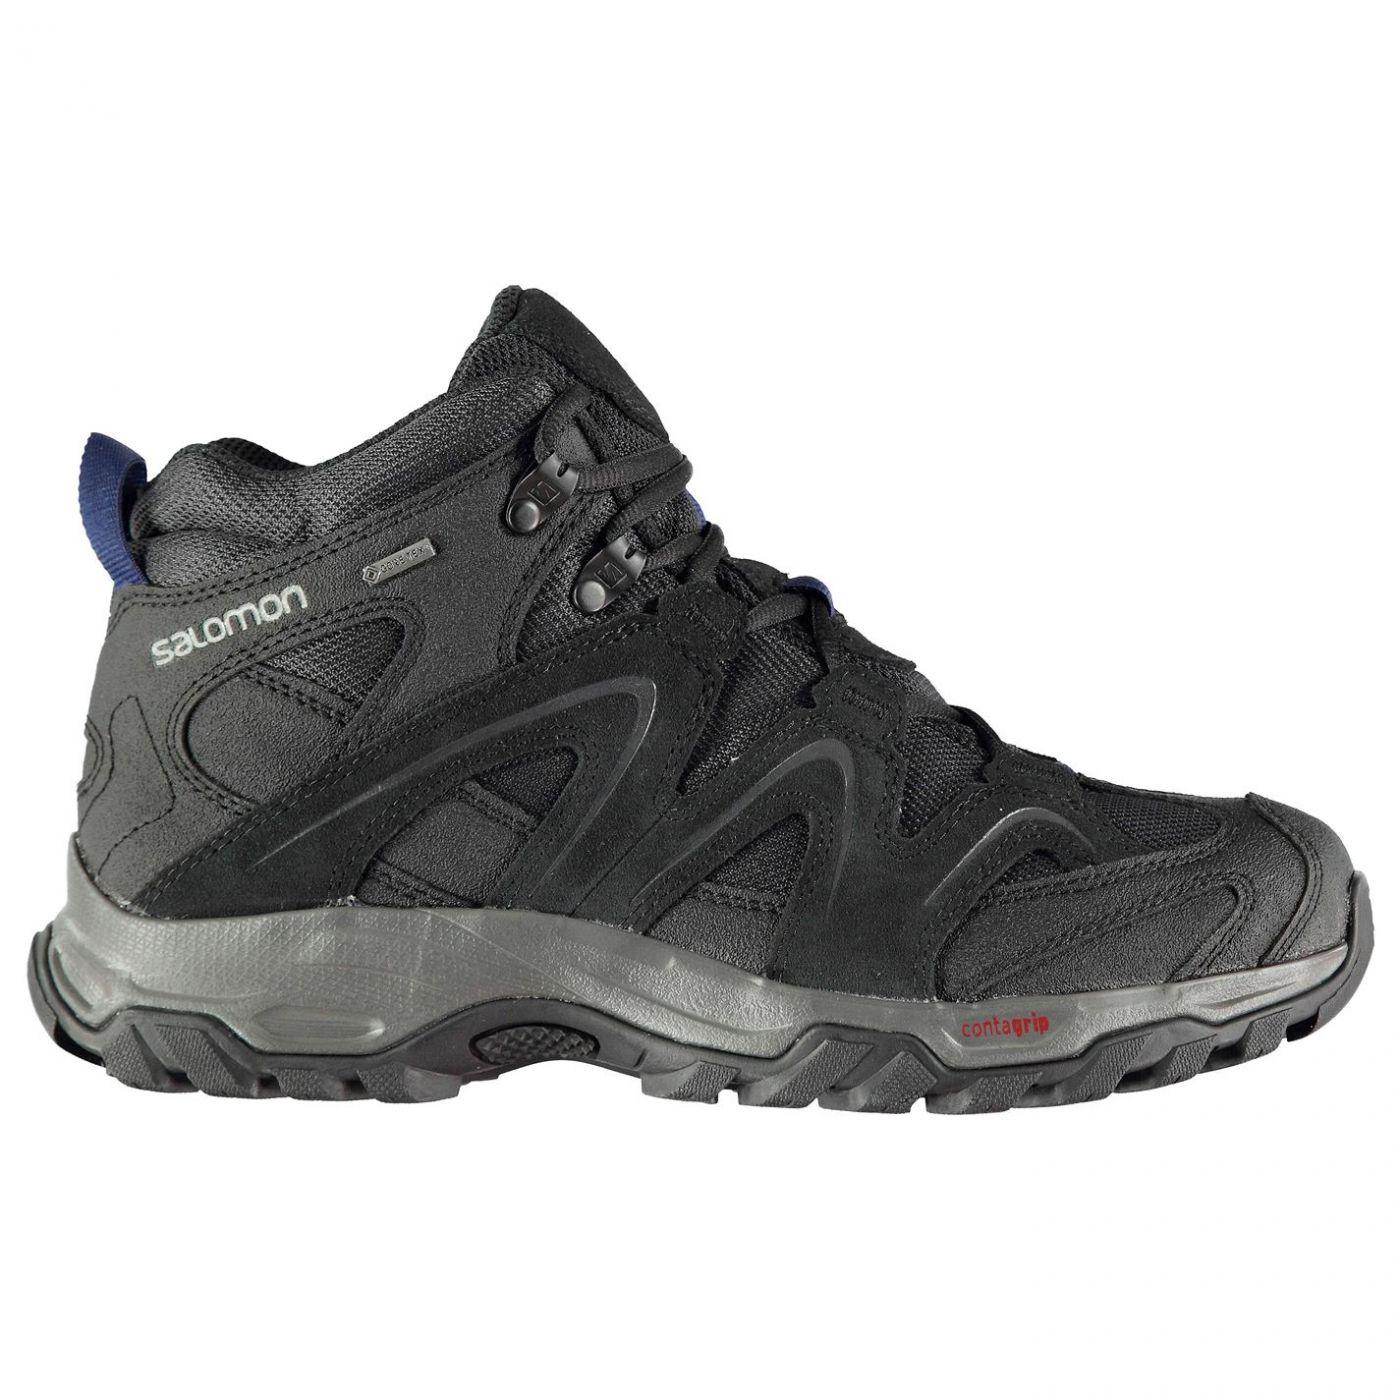 Salomon Vandon Md GTX Mens Walking Boots